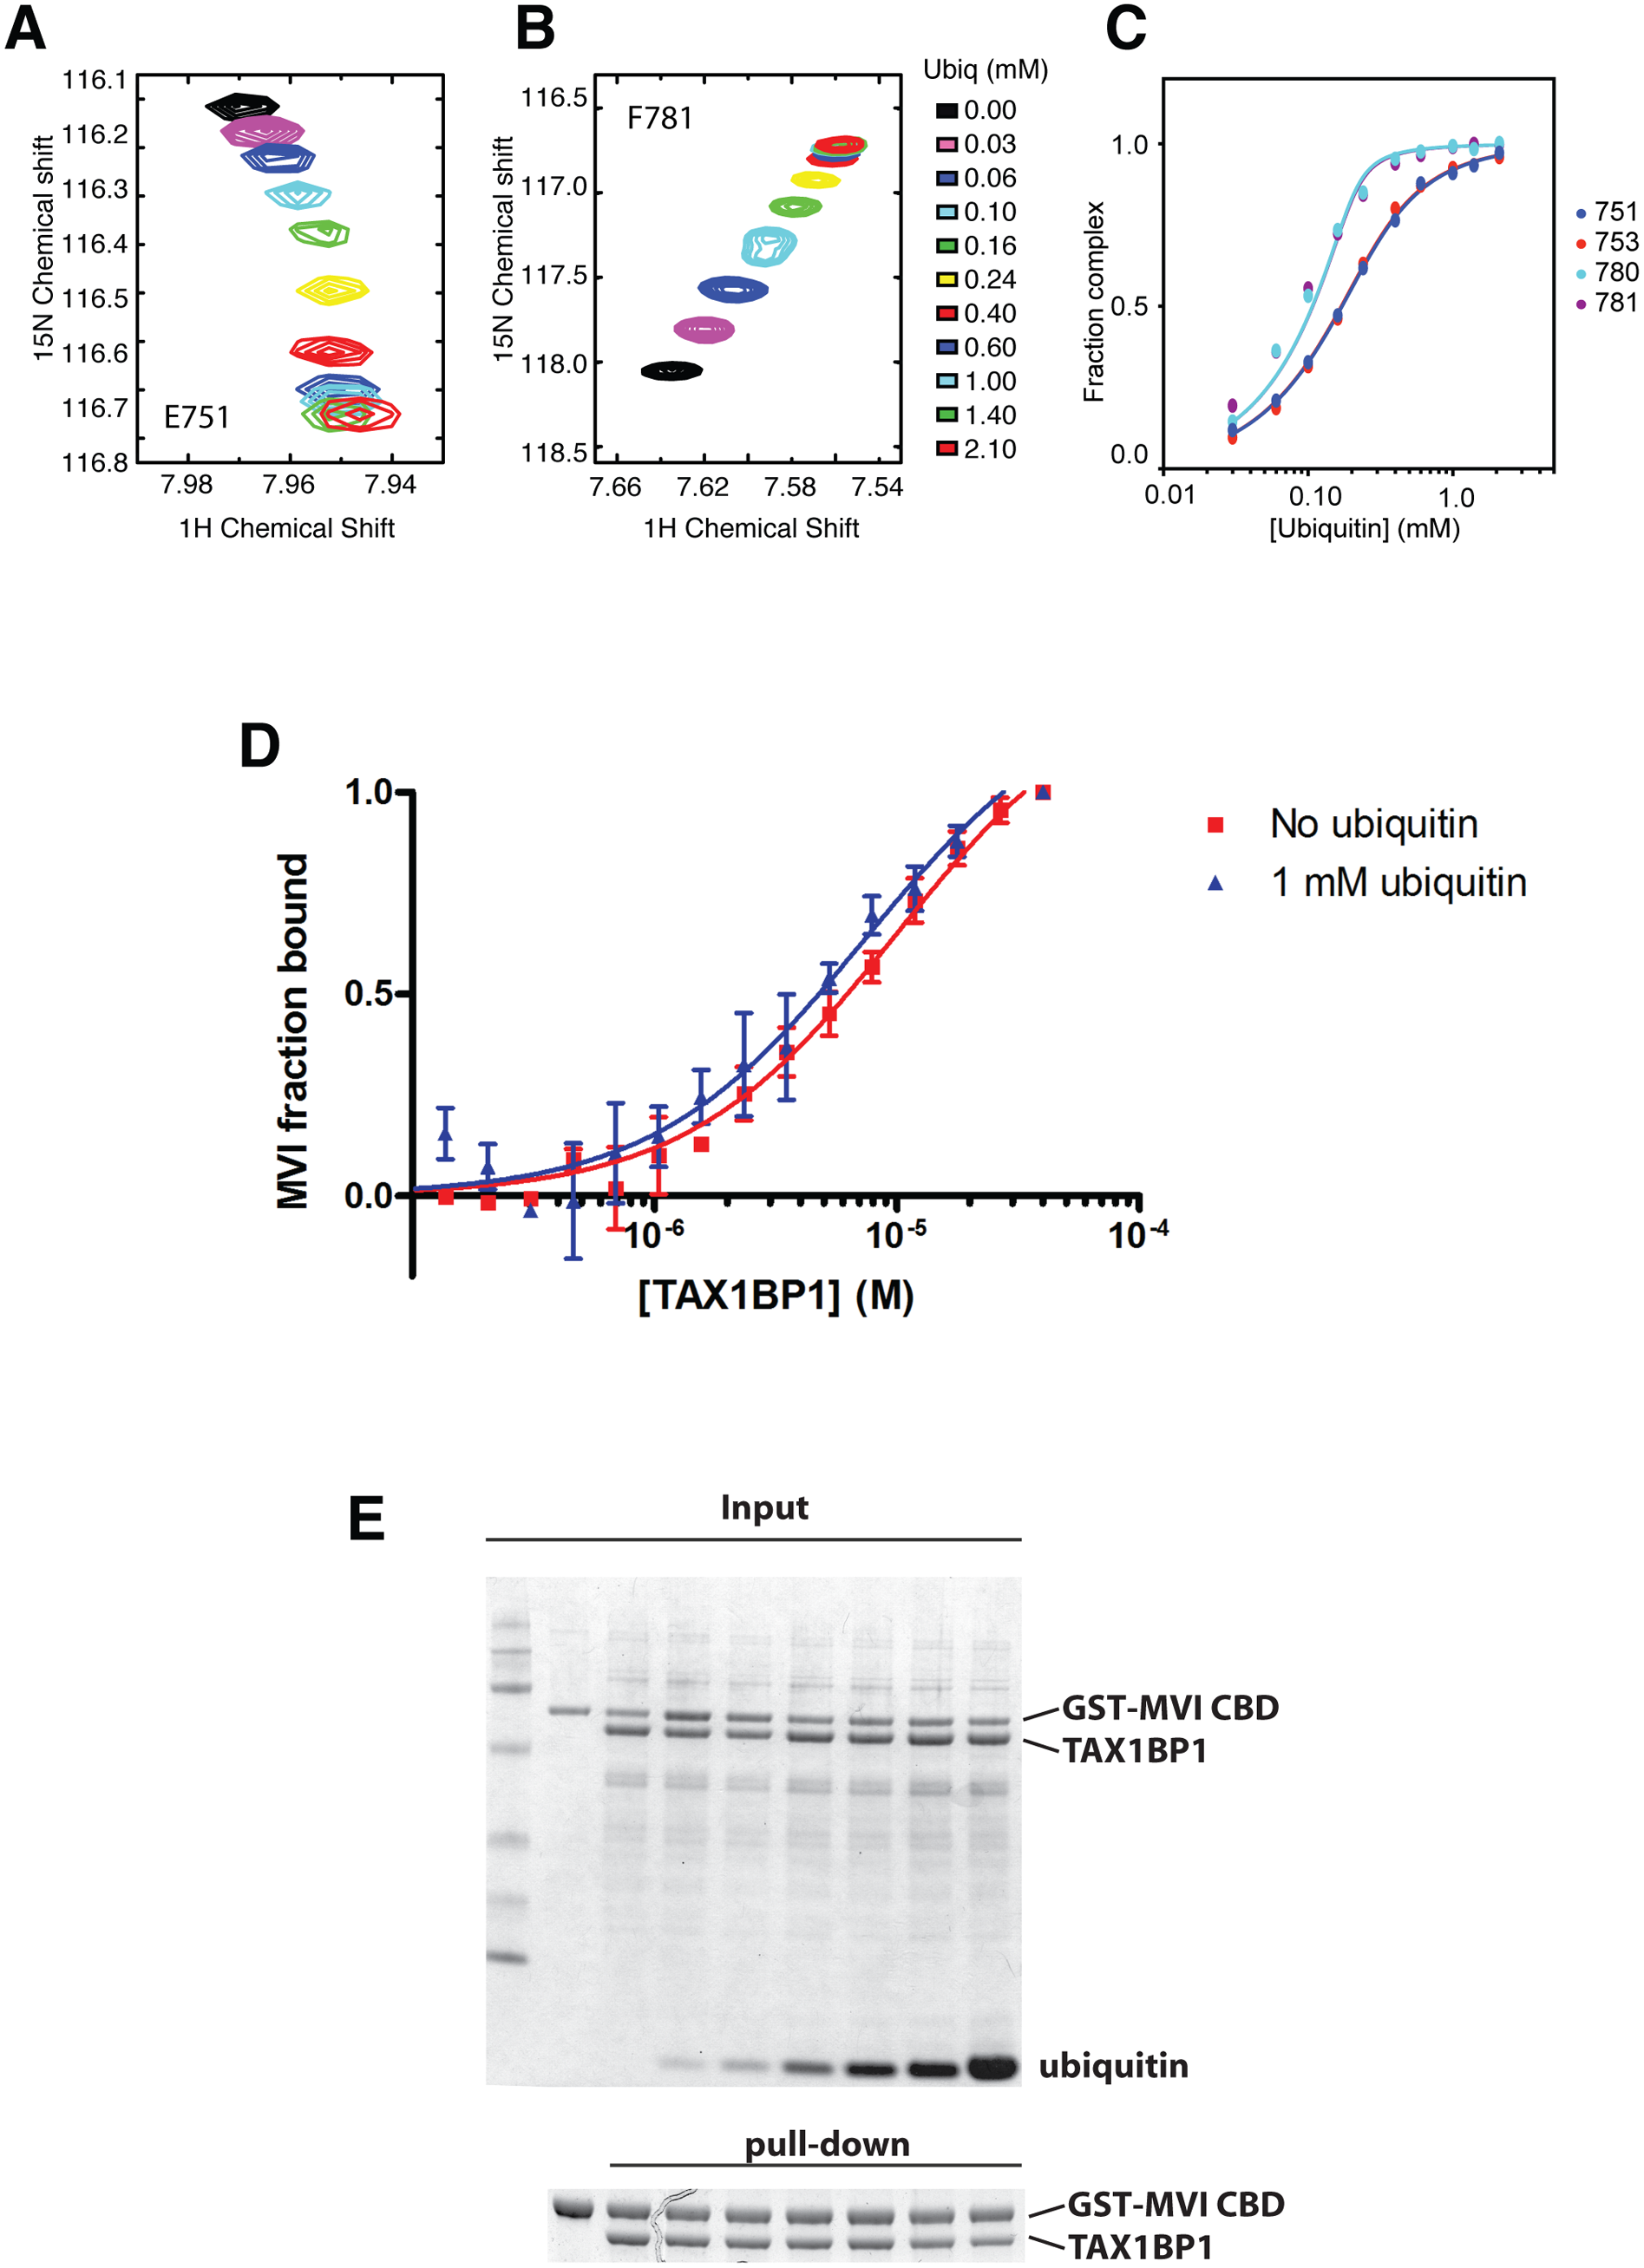 Binding of TAX1BP1 zinc finger domains to ubiquitin and myosin VI.